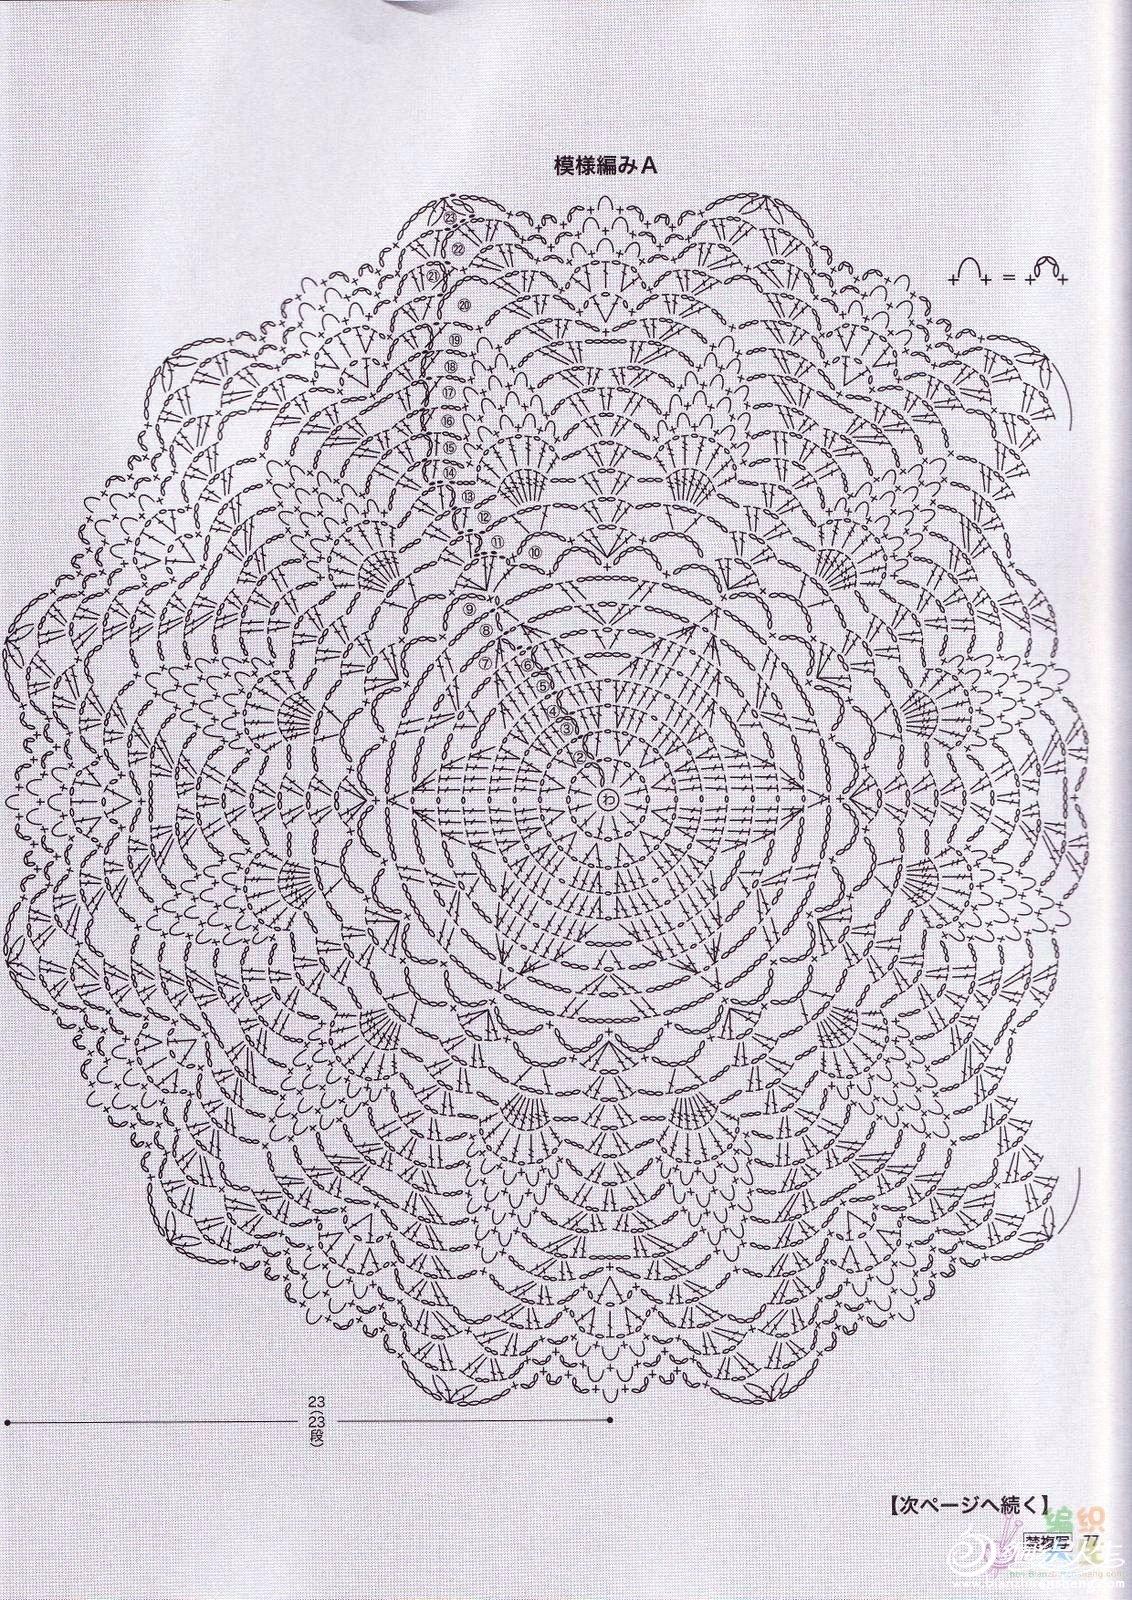 R菠萝2.jpg